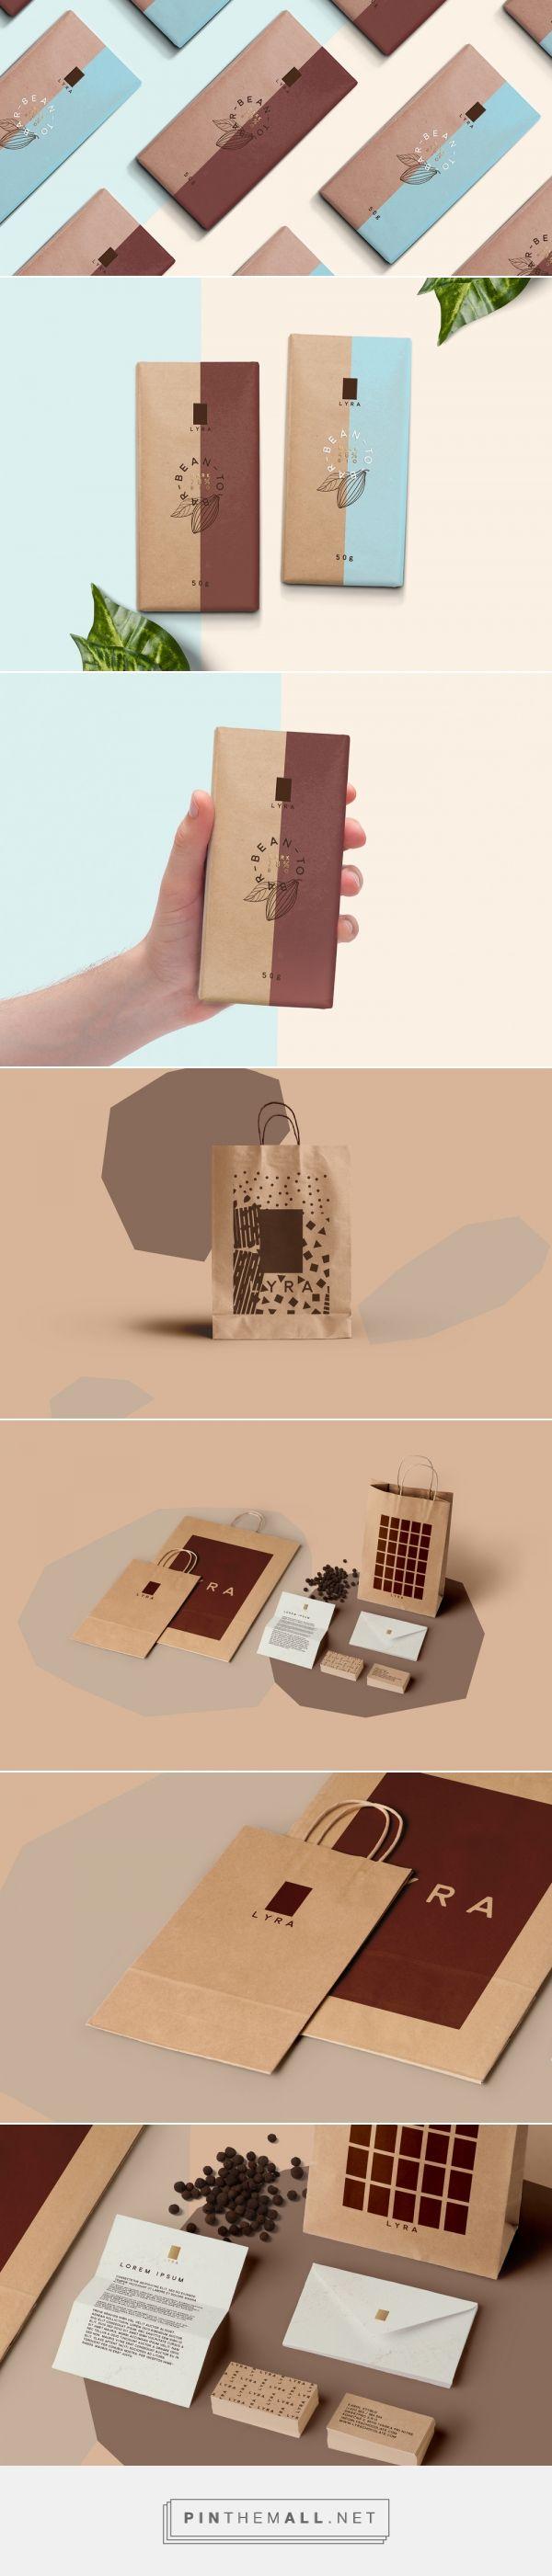 Lyra Bean-to-Bar Chocolate — The Dieline - Branding & Packaging Design - created via https://pinthemall.net